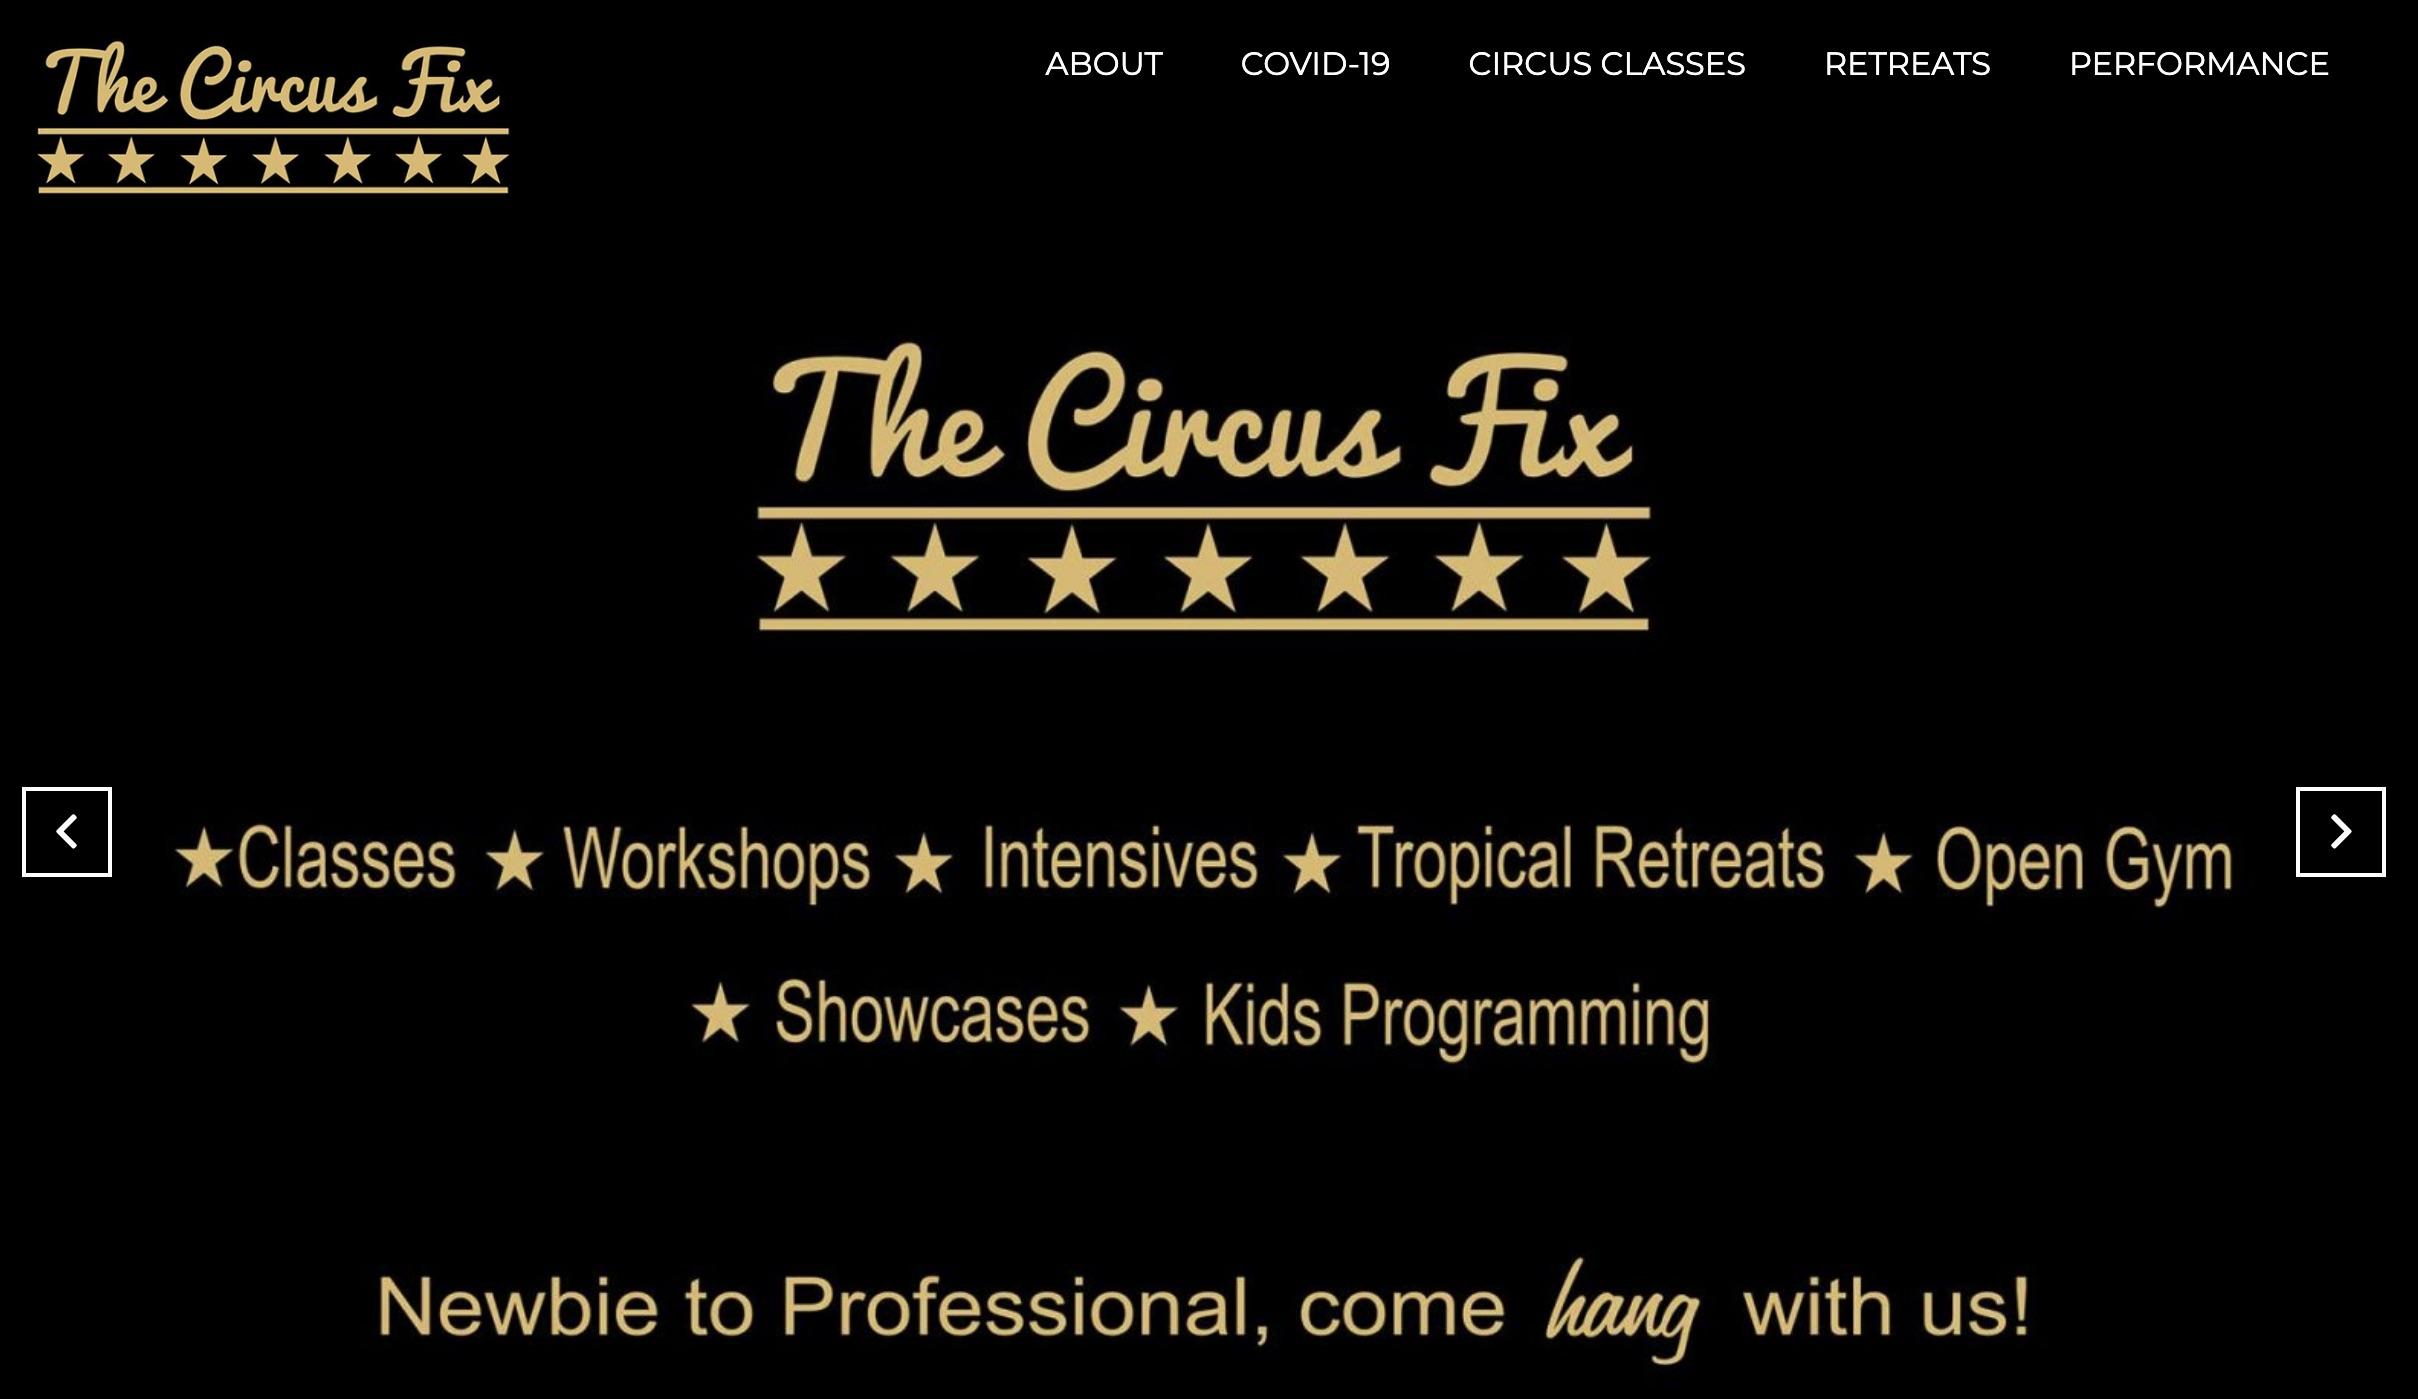 The Circus Fix